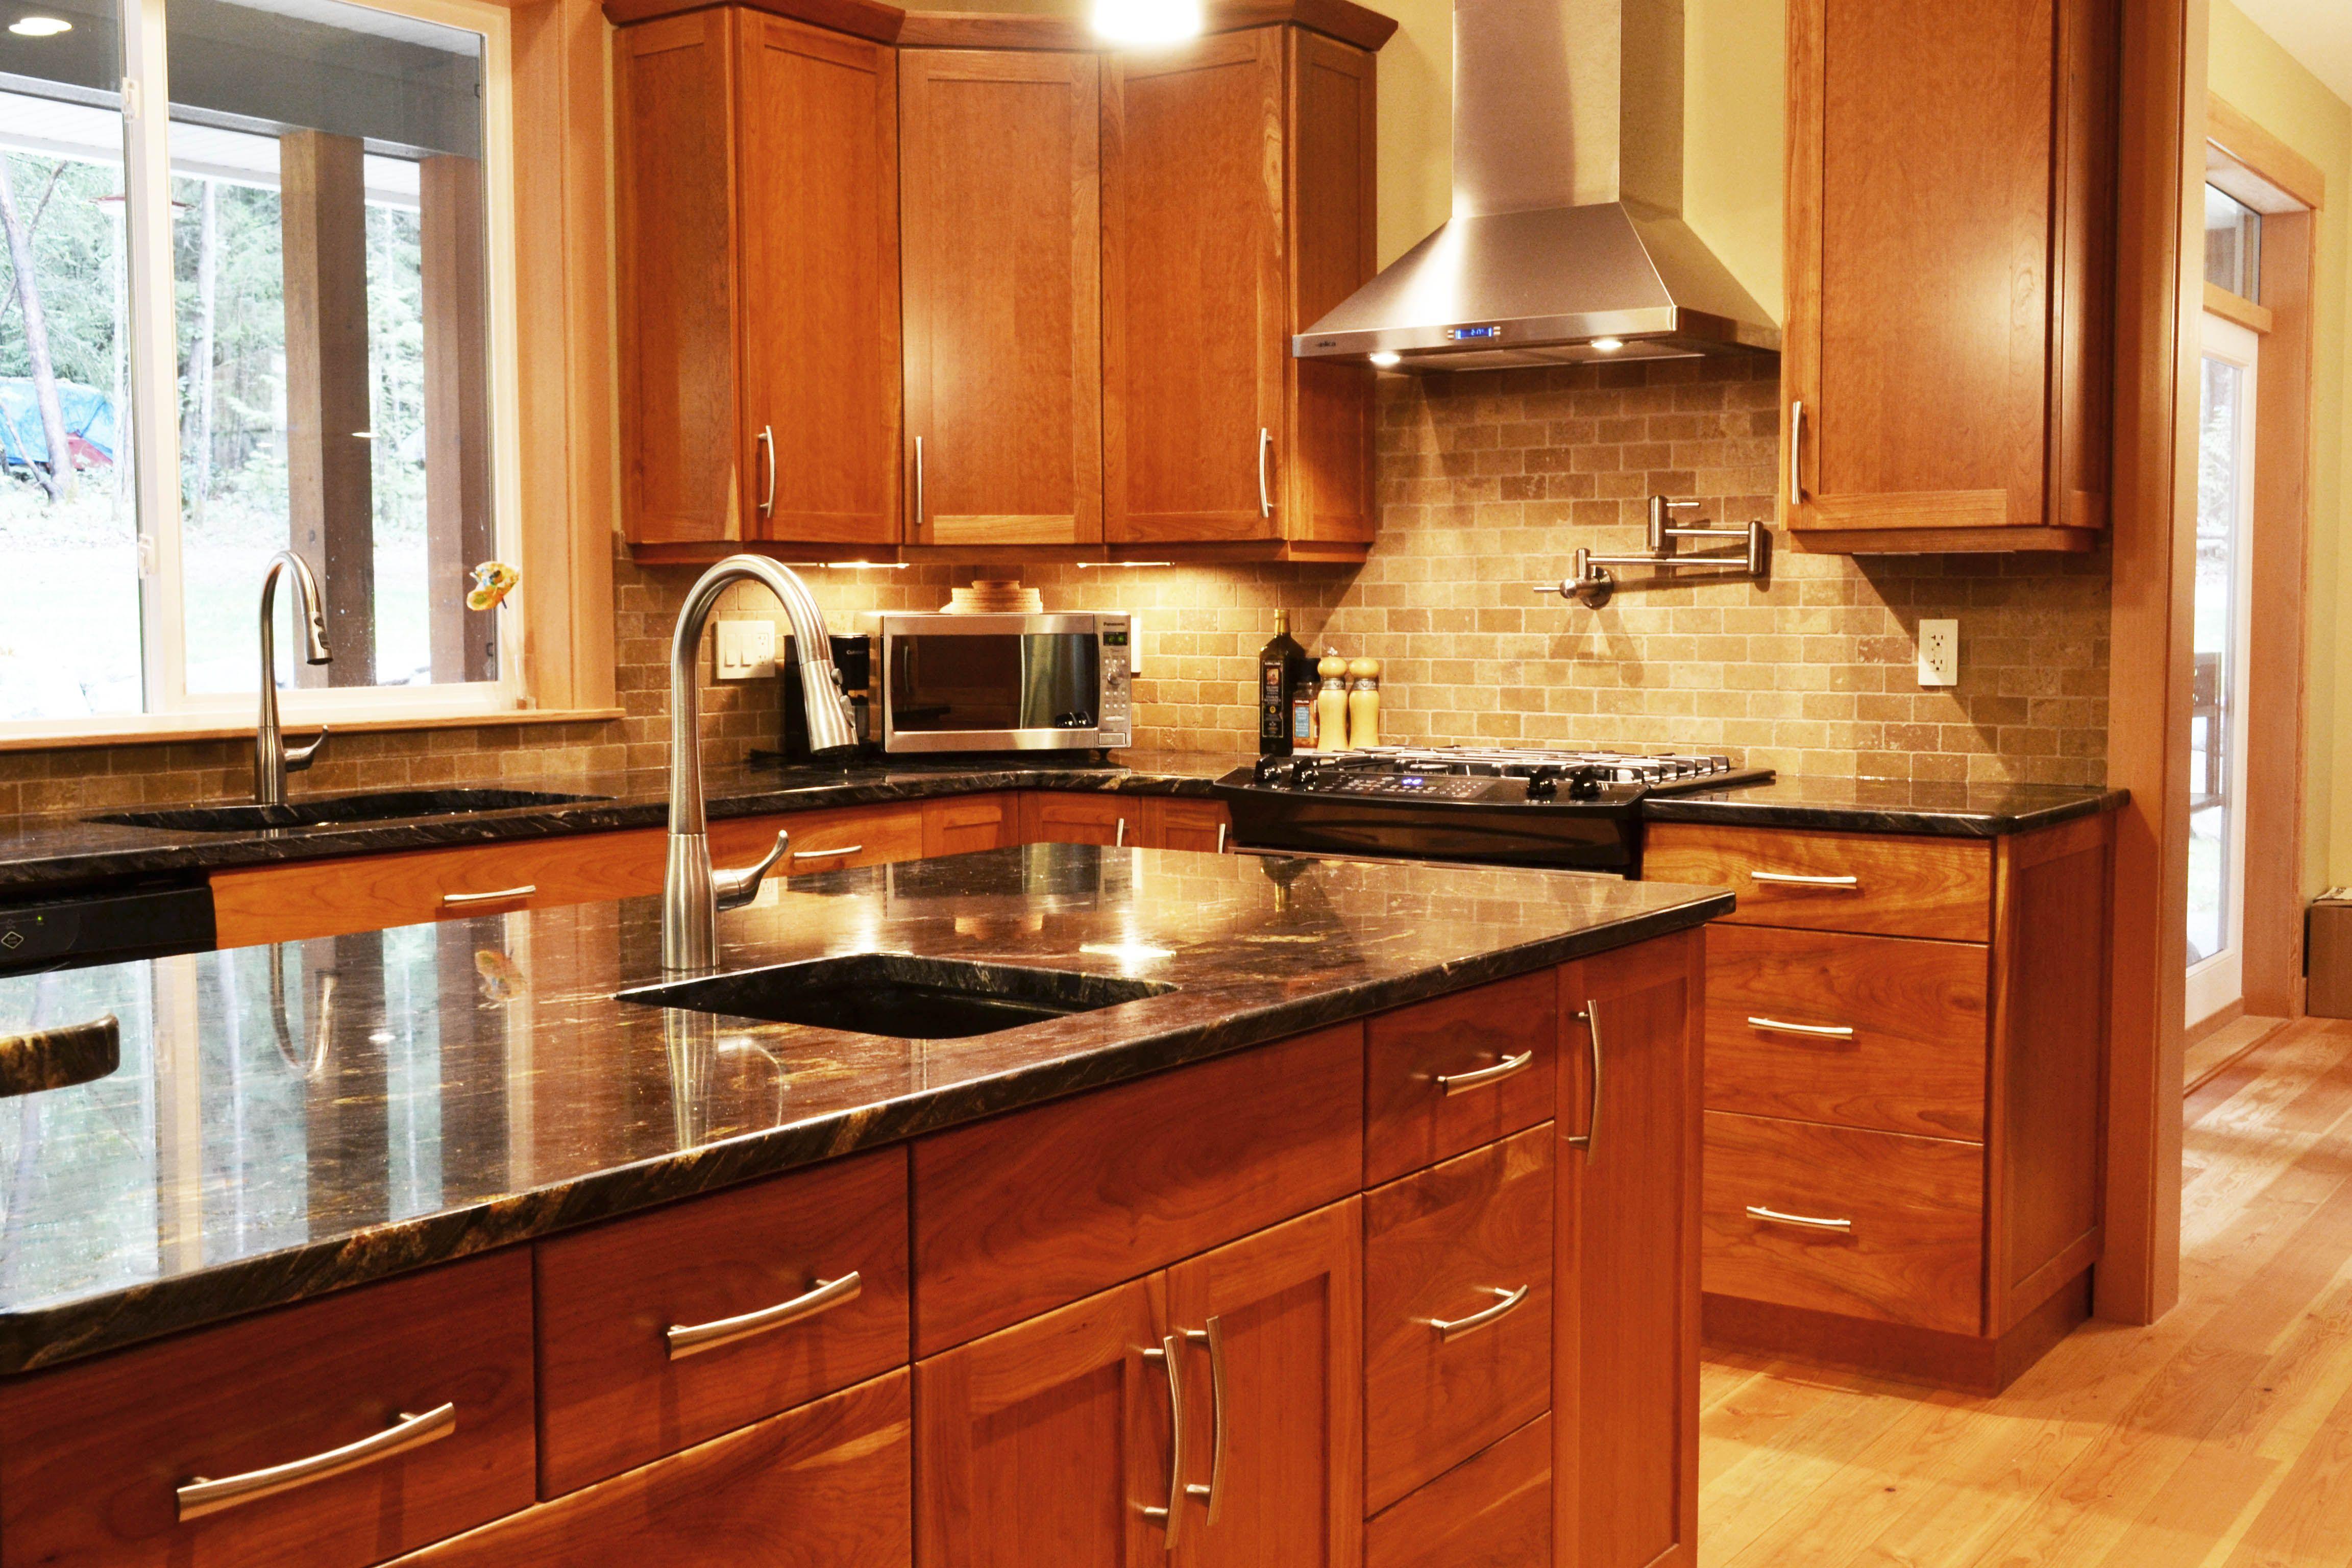 Best Natural Cherry Kitchen Cabinets Cabinets 4608X3072 400 x 300